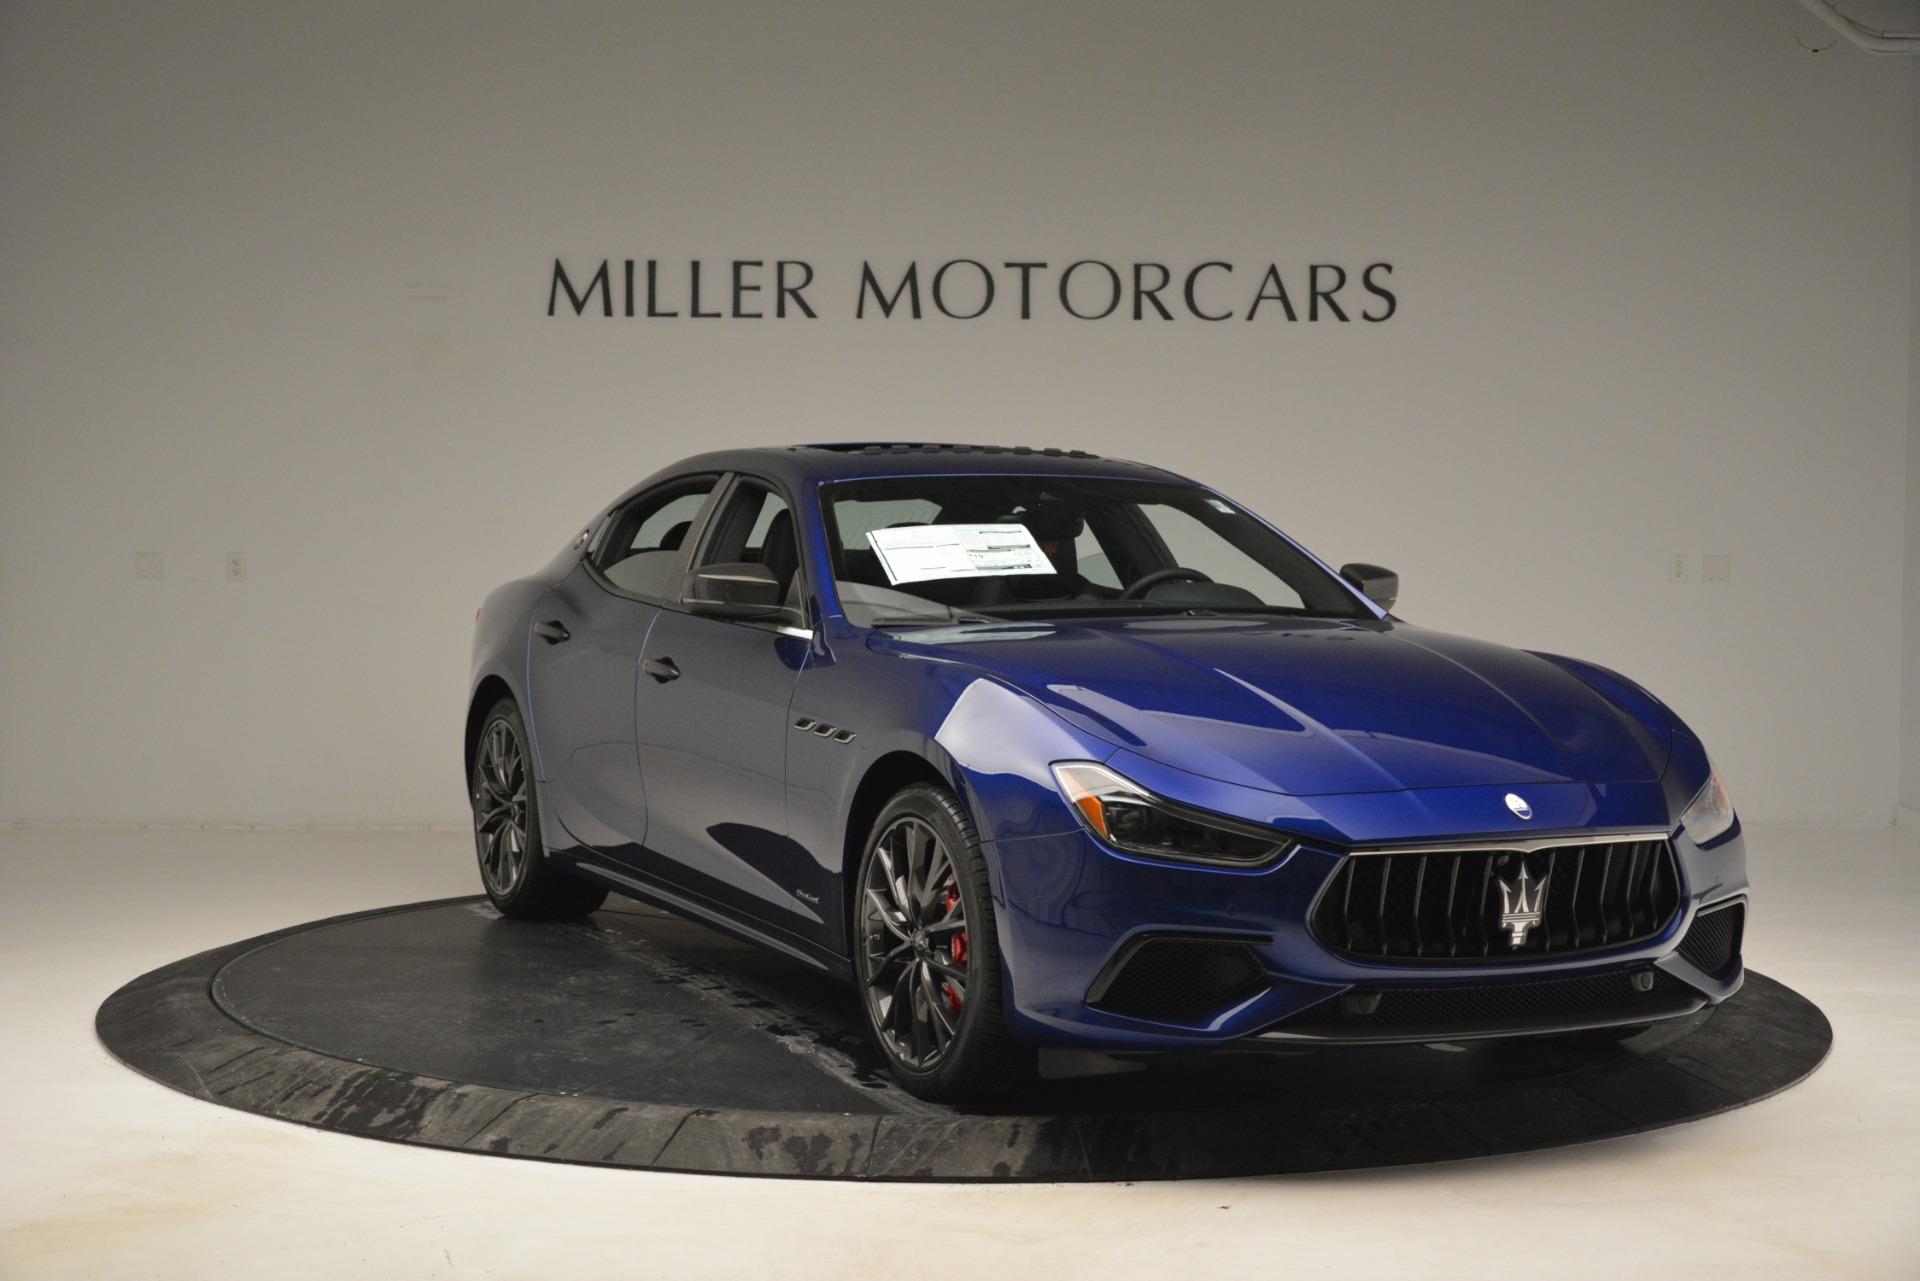 New 2019 Maserati Ghibli S Q4 GranSport For Sale In Westport, CT 2978_p11